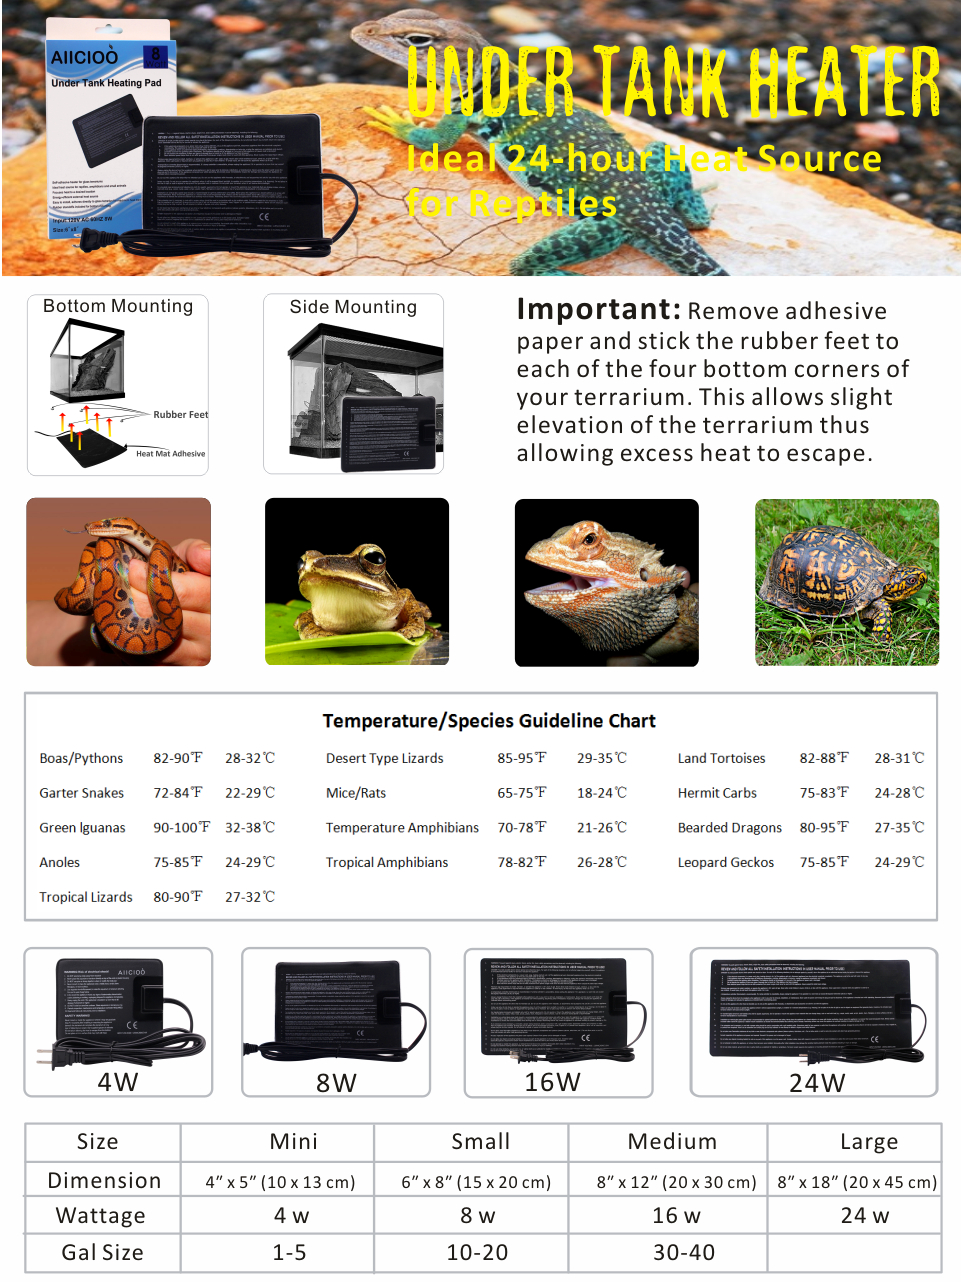 Amazon Com Under Tank Heater Aiicioo Reptile Heating